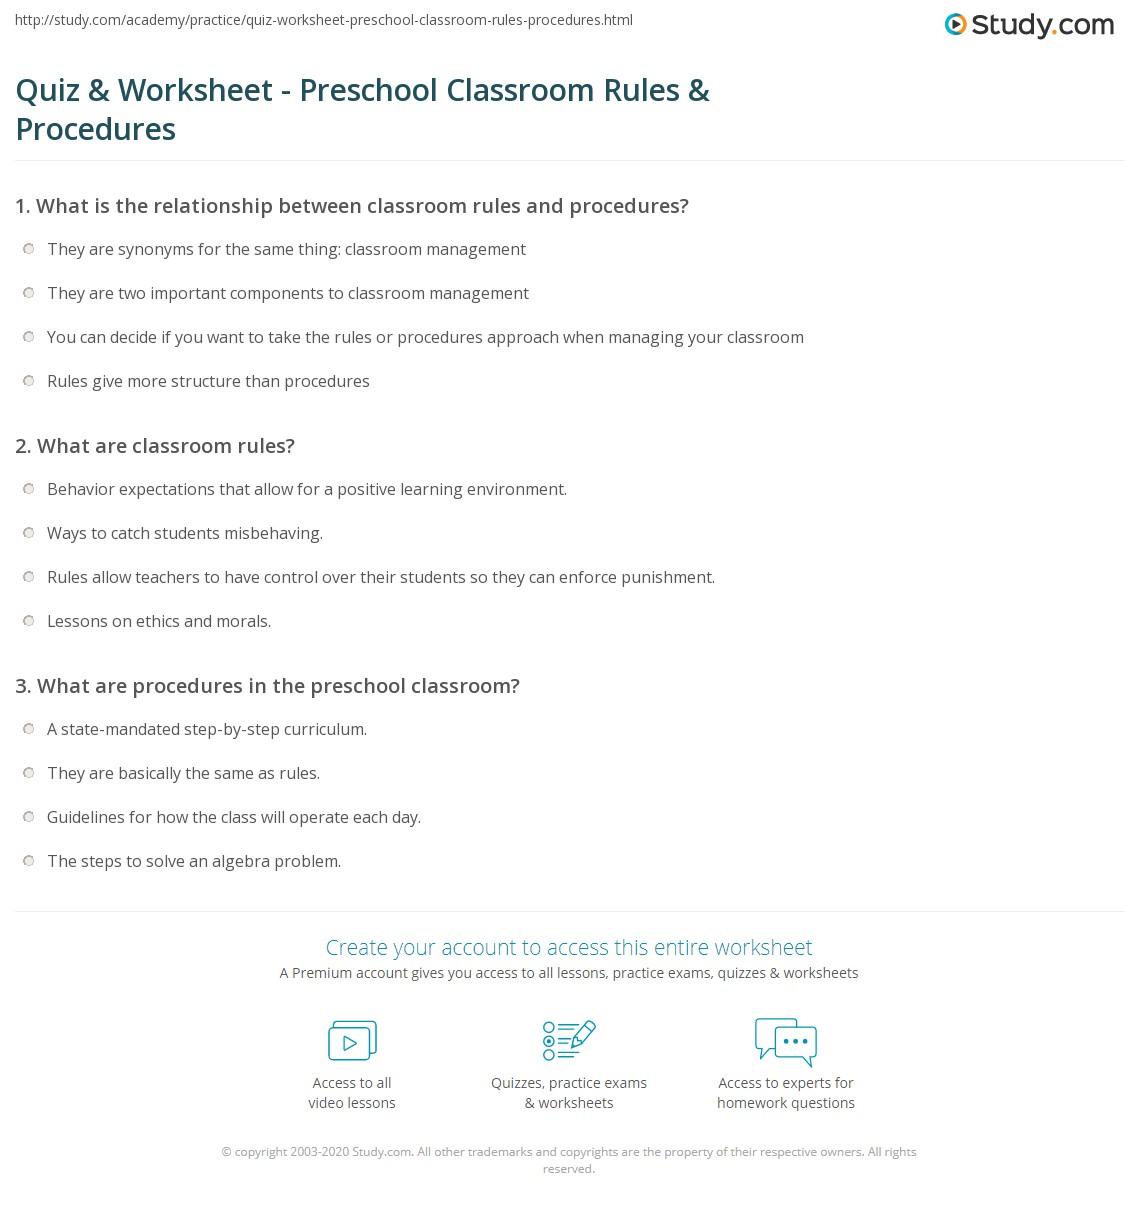 Rules Procedures: Preschool Classroom Rules & Procedures